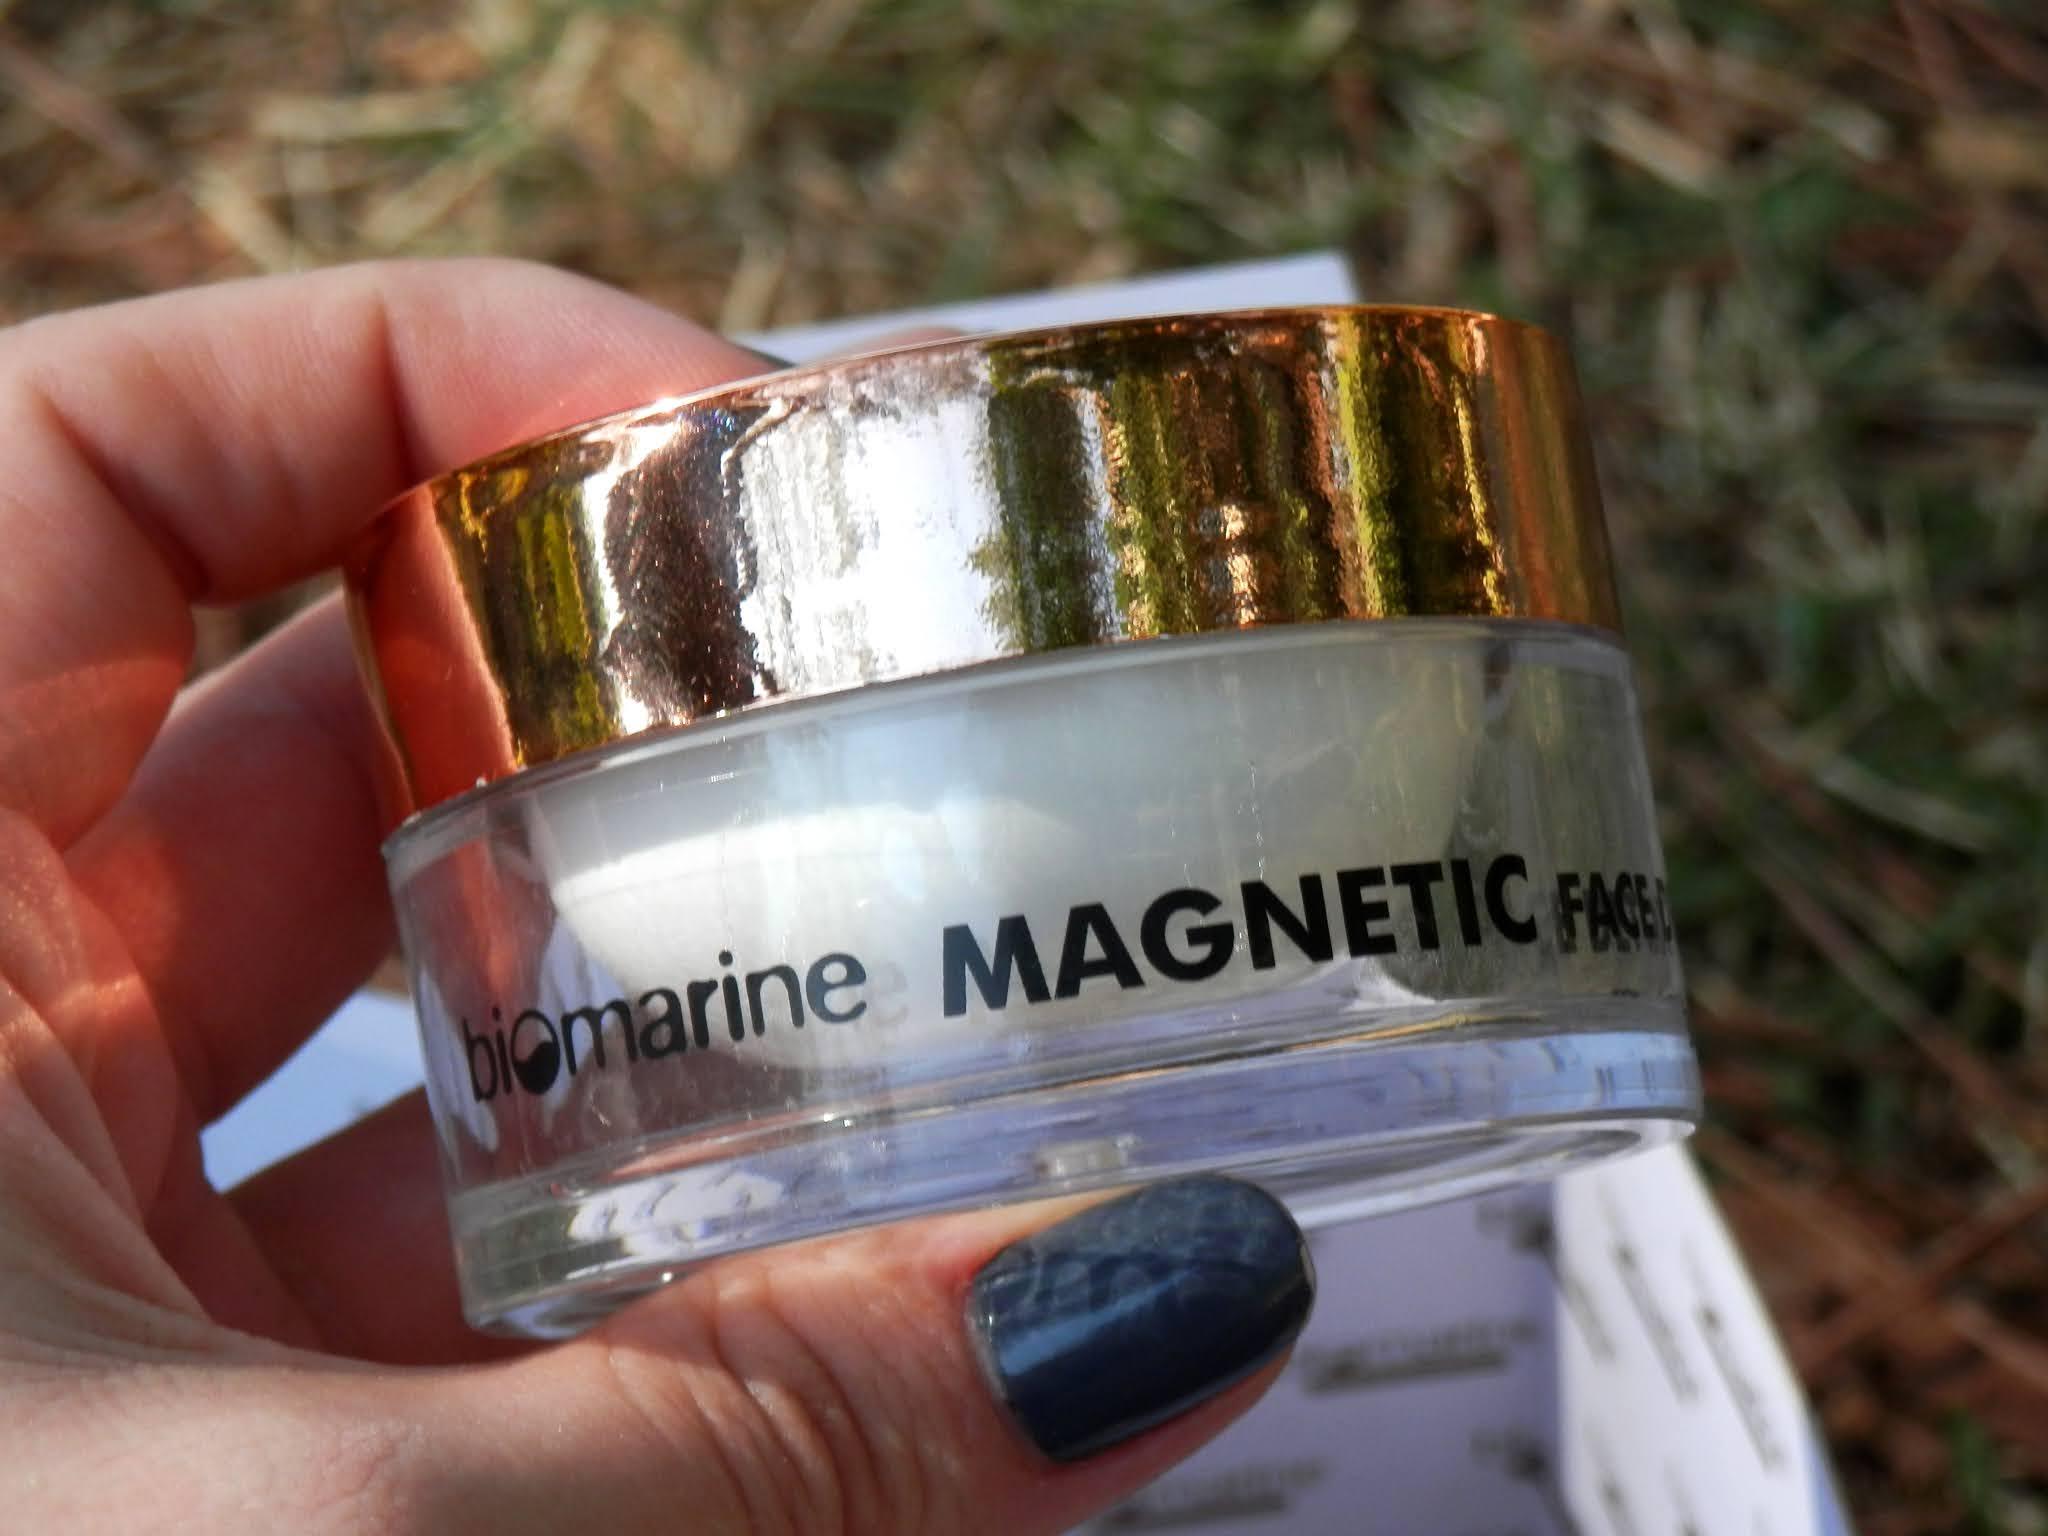 Rever C Magnetic Face Detox da Biomarine